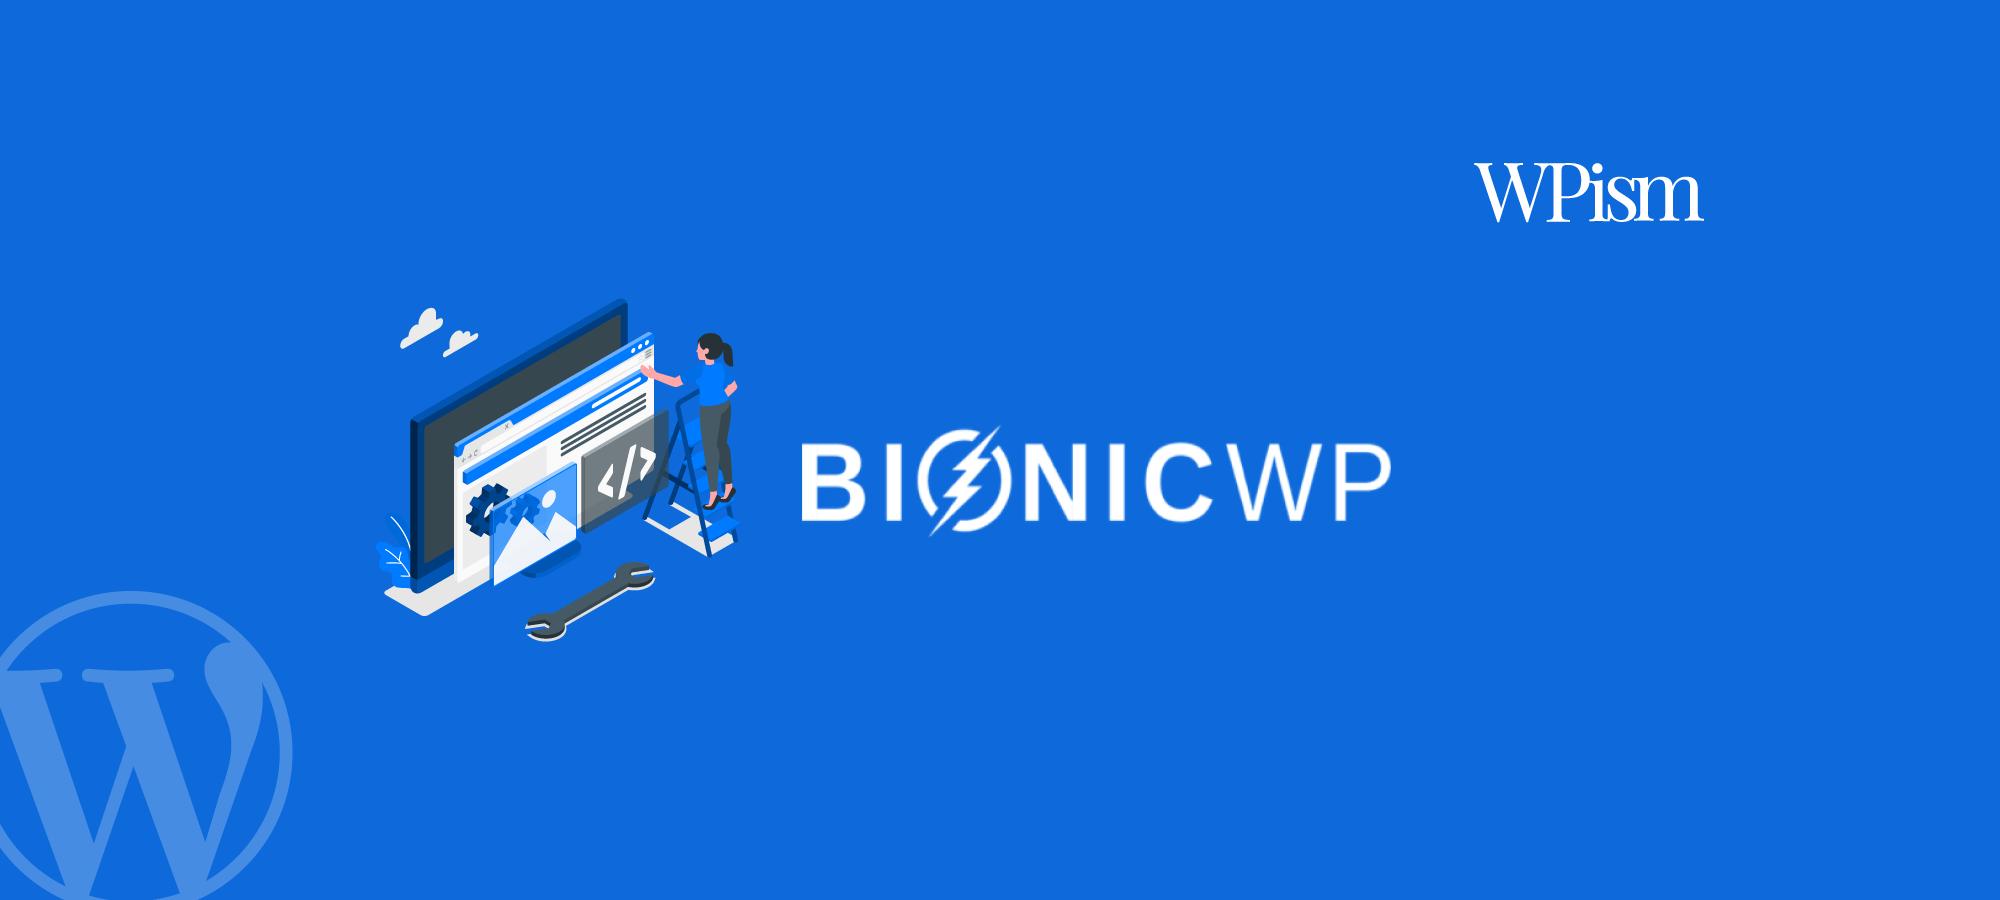 BionicWP Coupon WordPress Hosting WPism